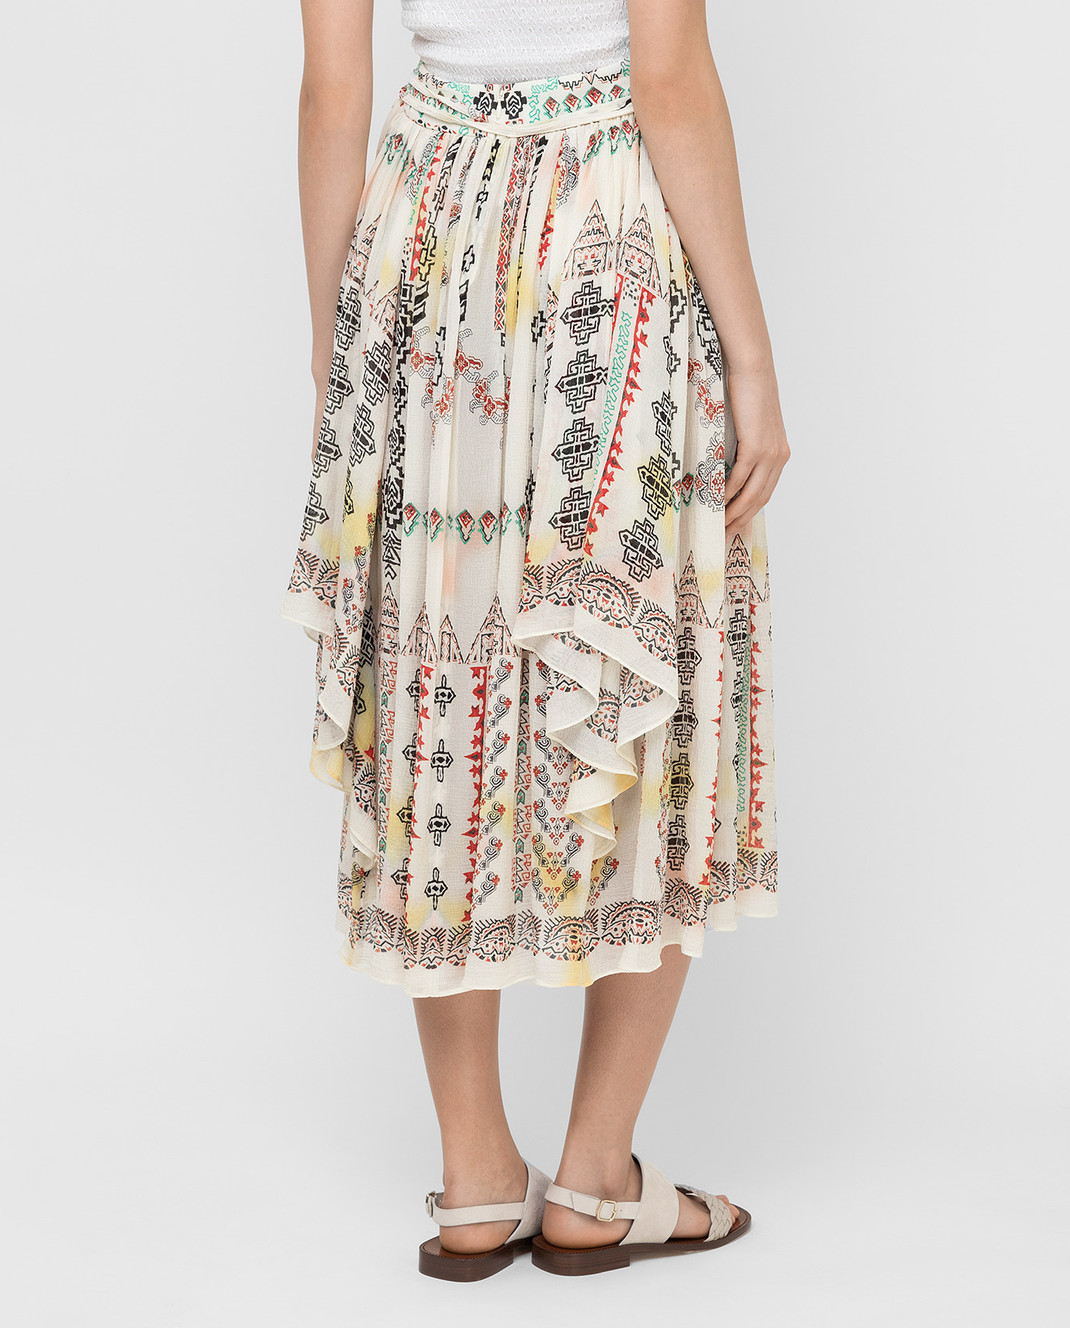 Etro Светло-бежевая юбка из шелка D18711 изображение 4